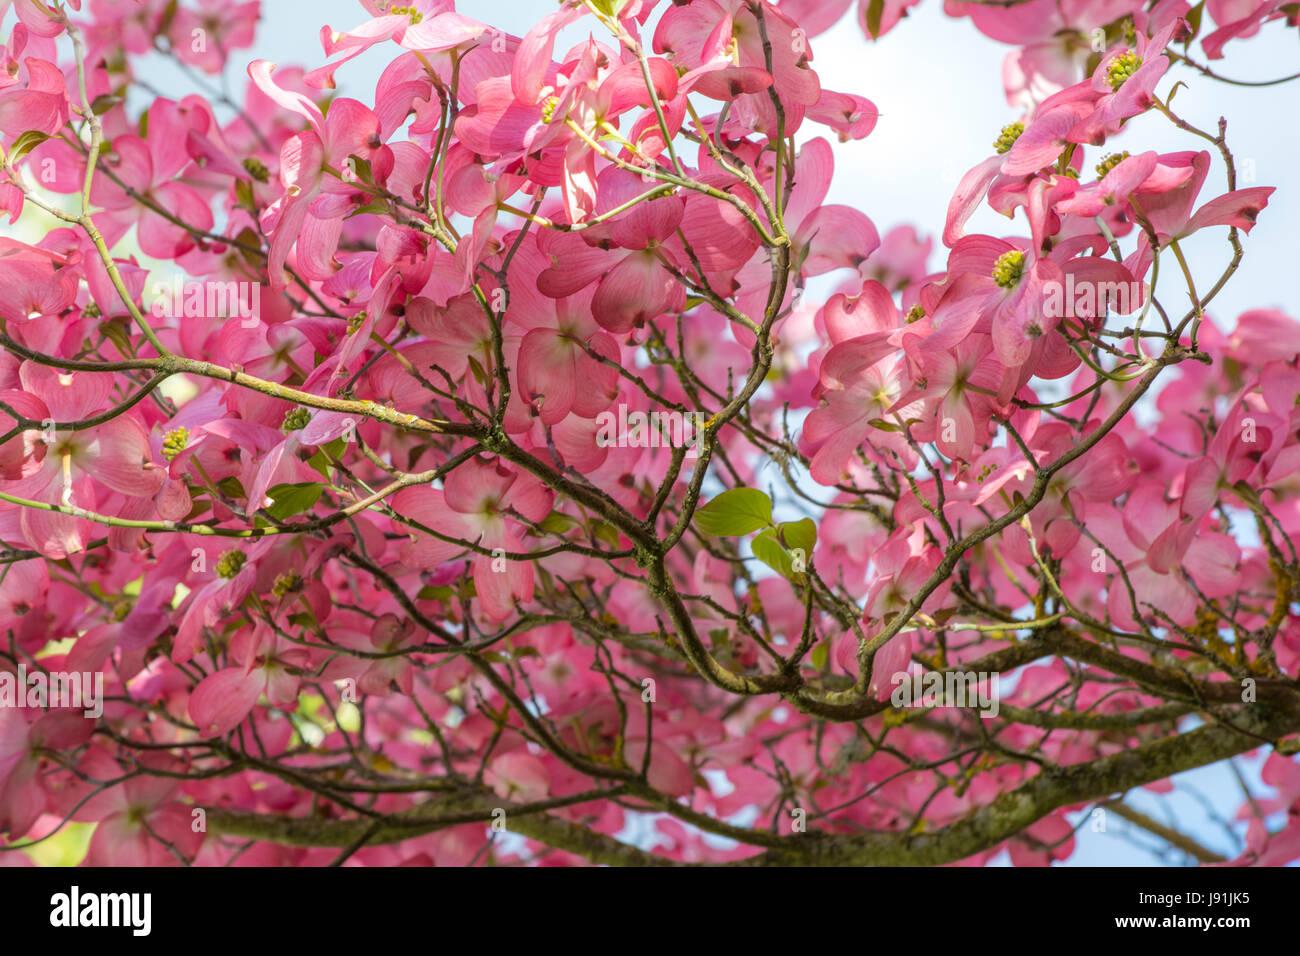 Dogwood Tree In Bloom Stock Photos Dogwood Tree In Bloom Stock